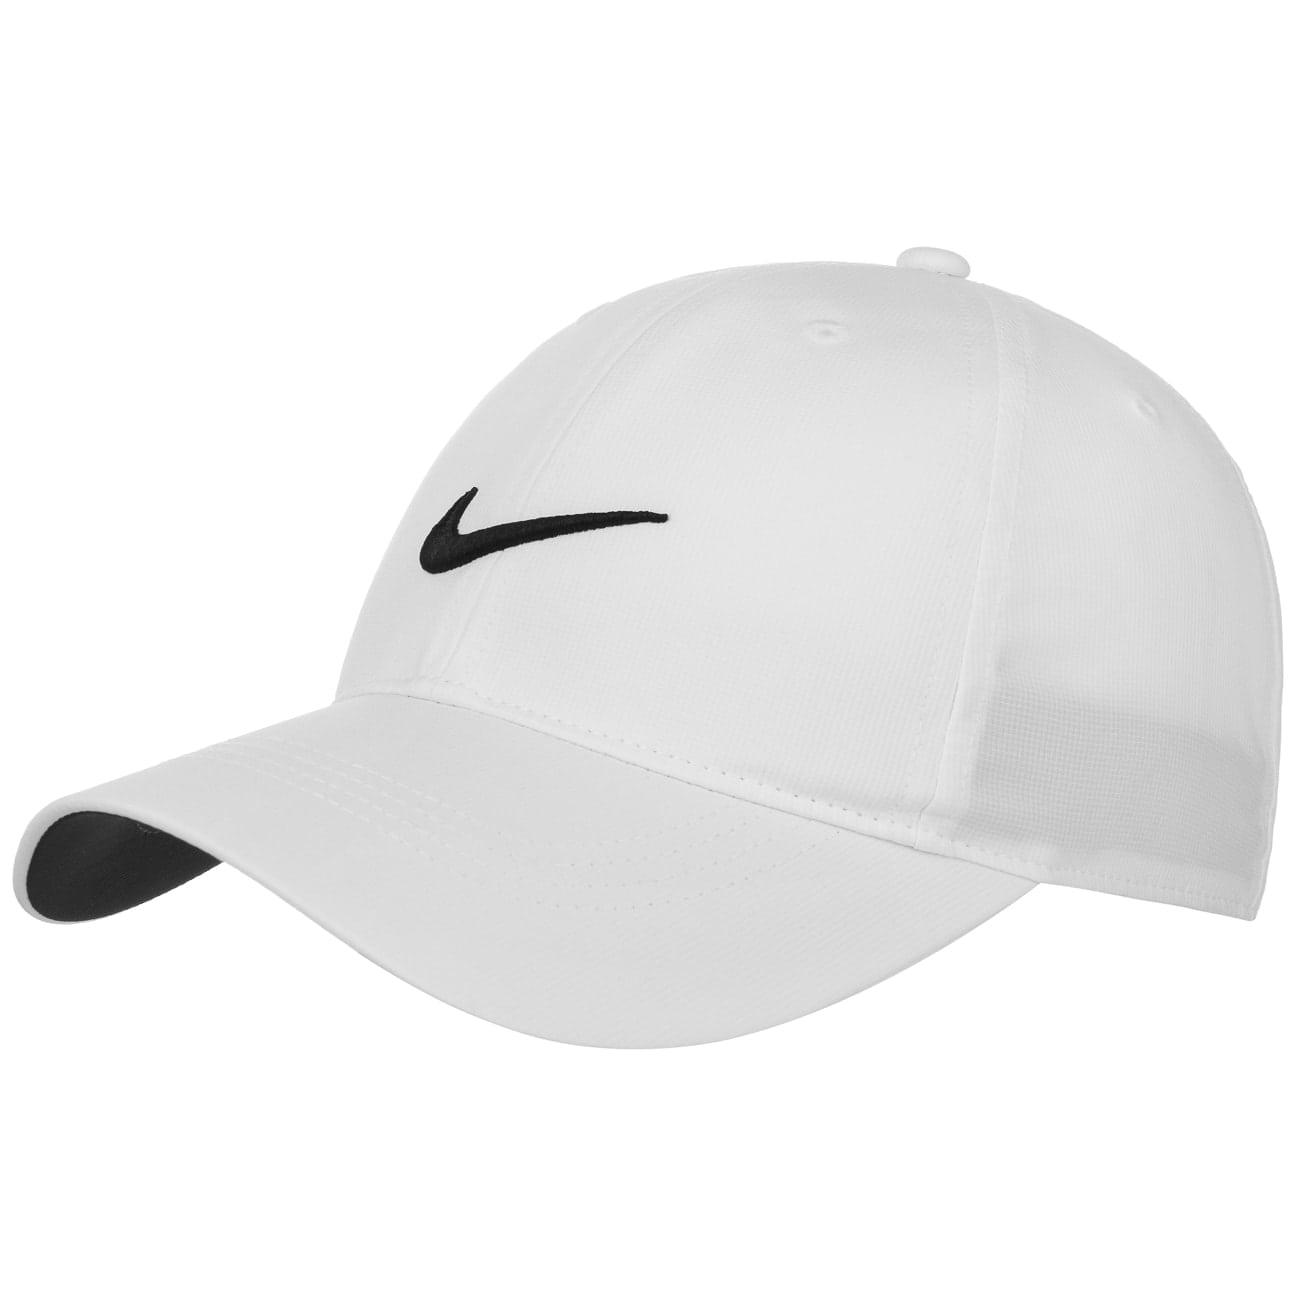 premium selection official site meet Casquette Legacy91 Tech Cap by Nike